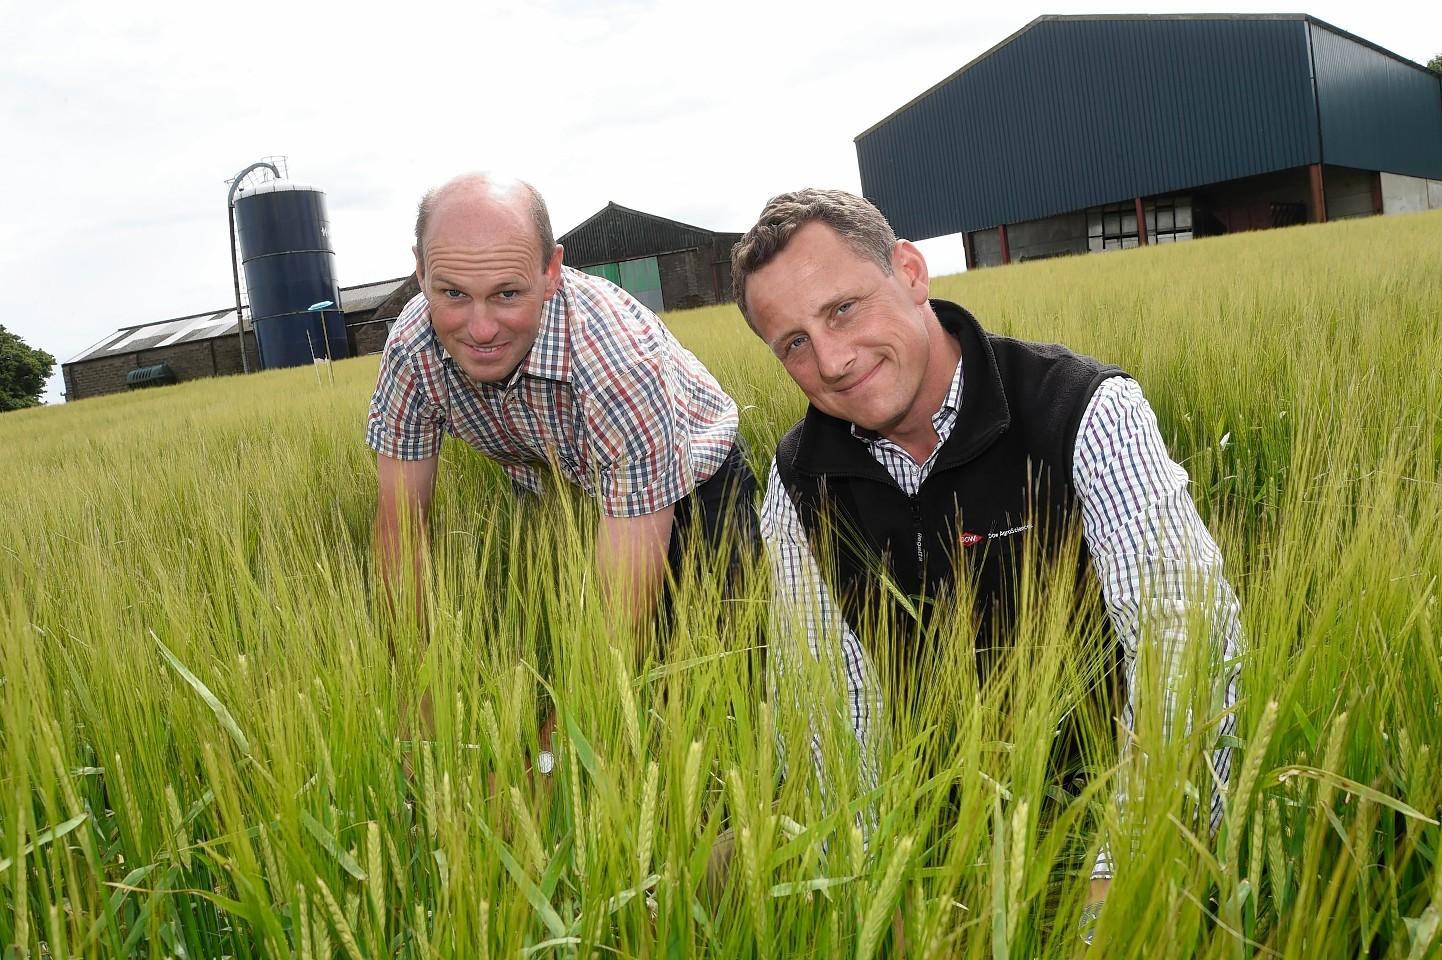 Stuart Jackson and Alex Nichols from Dow AgroSciences